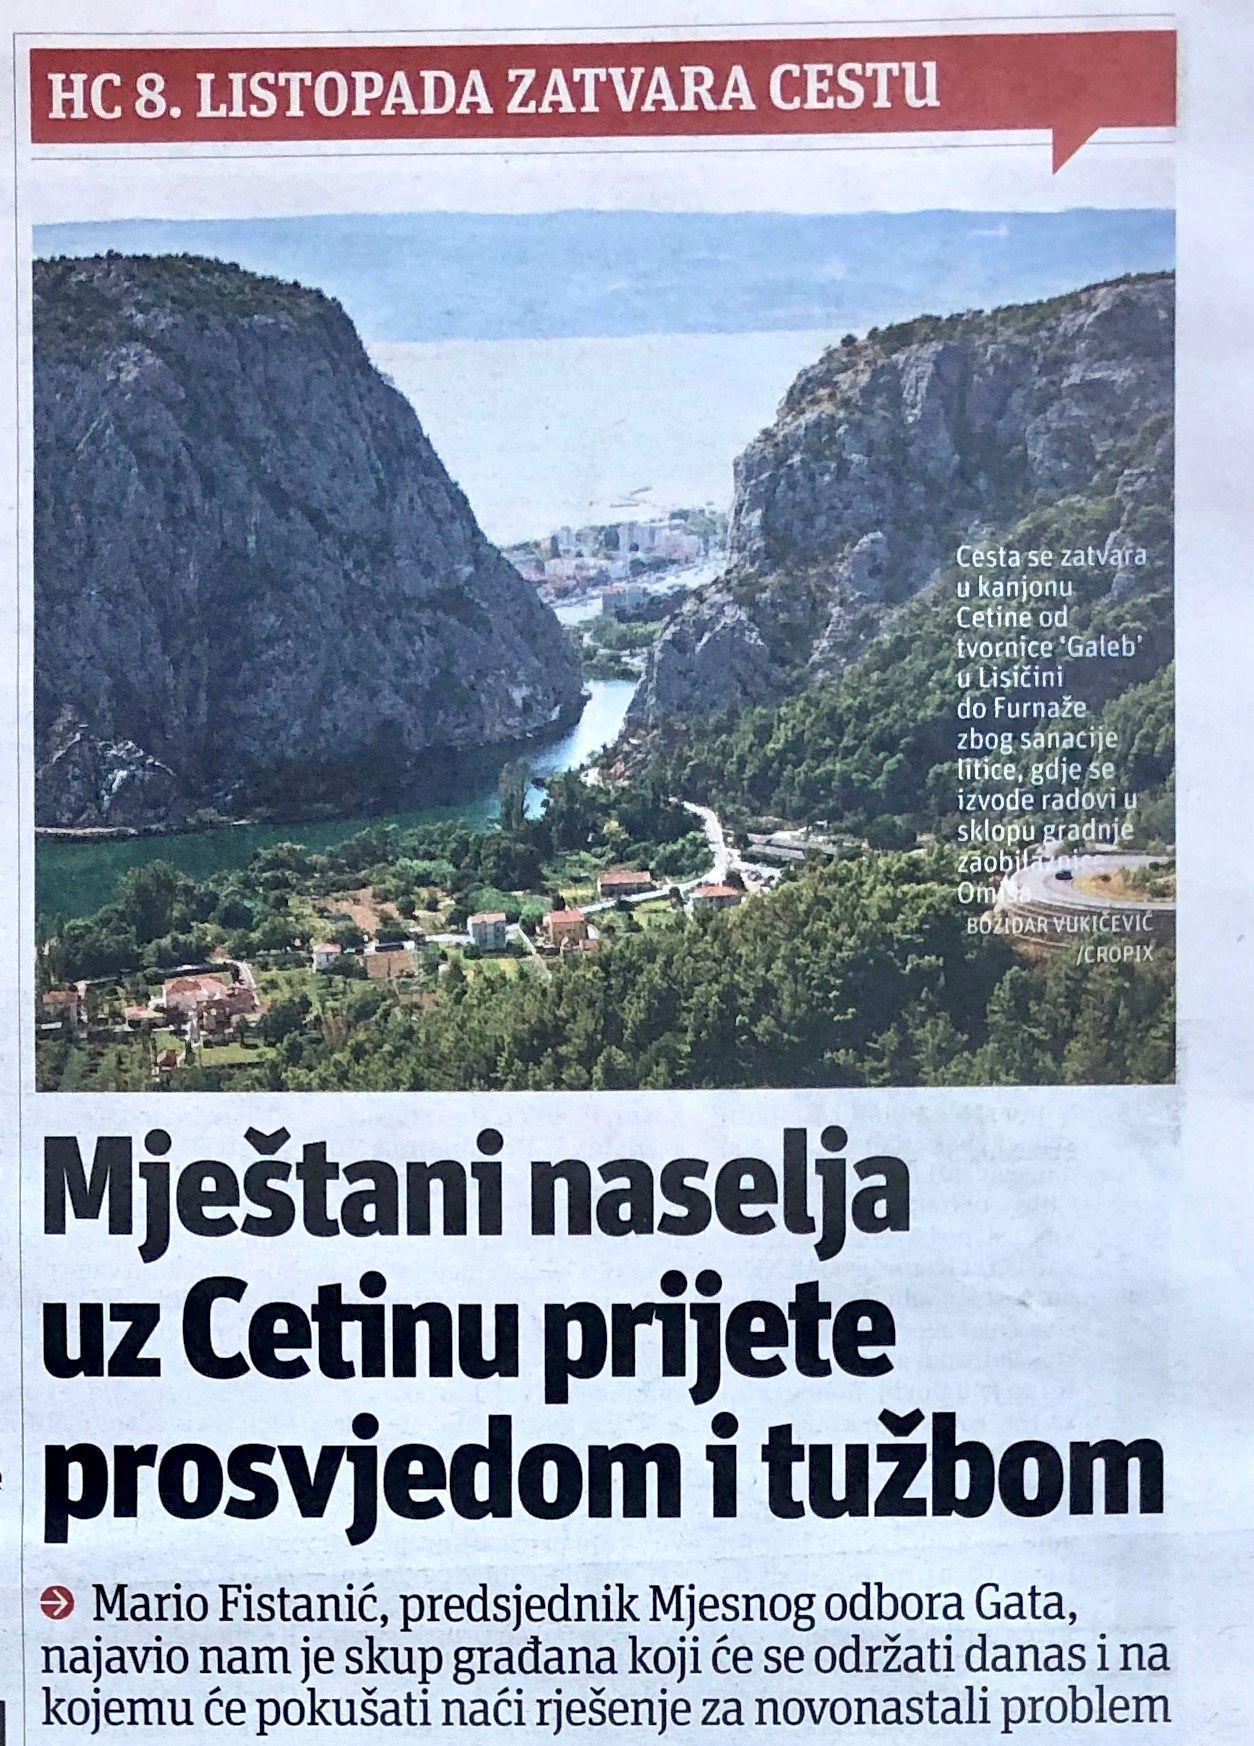 U povodu najave zatvaranja ceste kroz Zakučac (8): PRAVEDNA BORBA POLJIČANA ZA PRAVO NA NORMALAN ŽIVOT I RAD